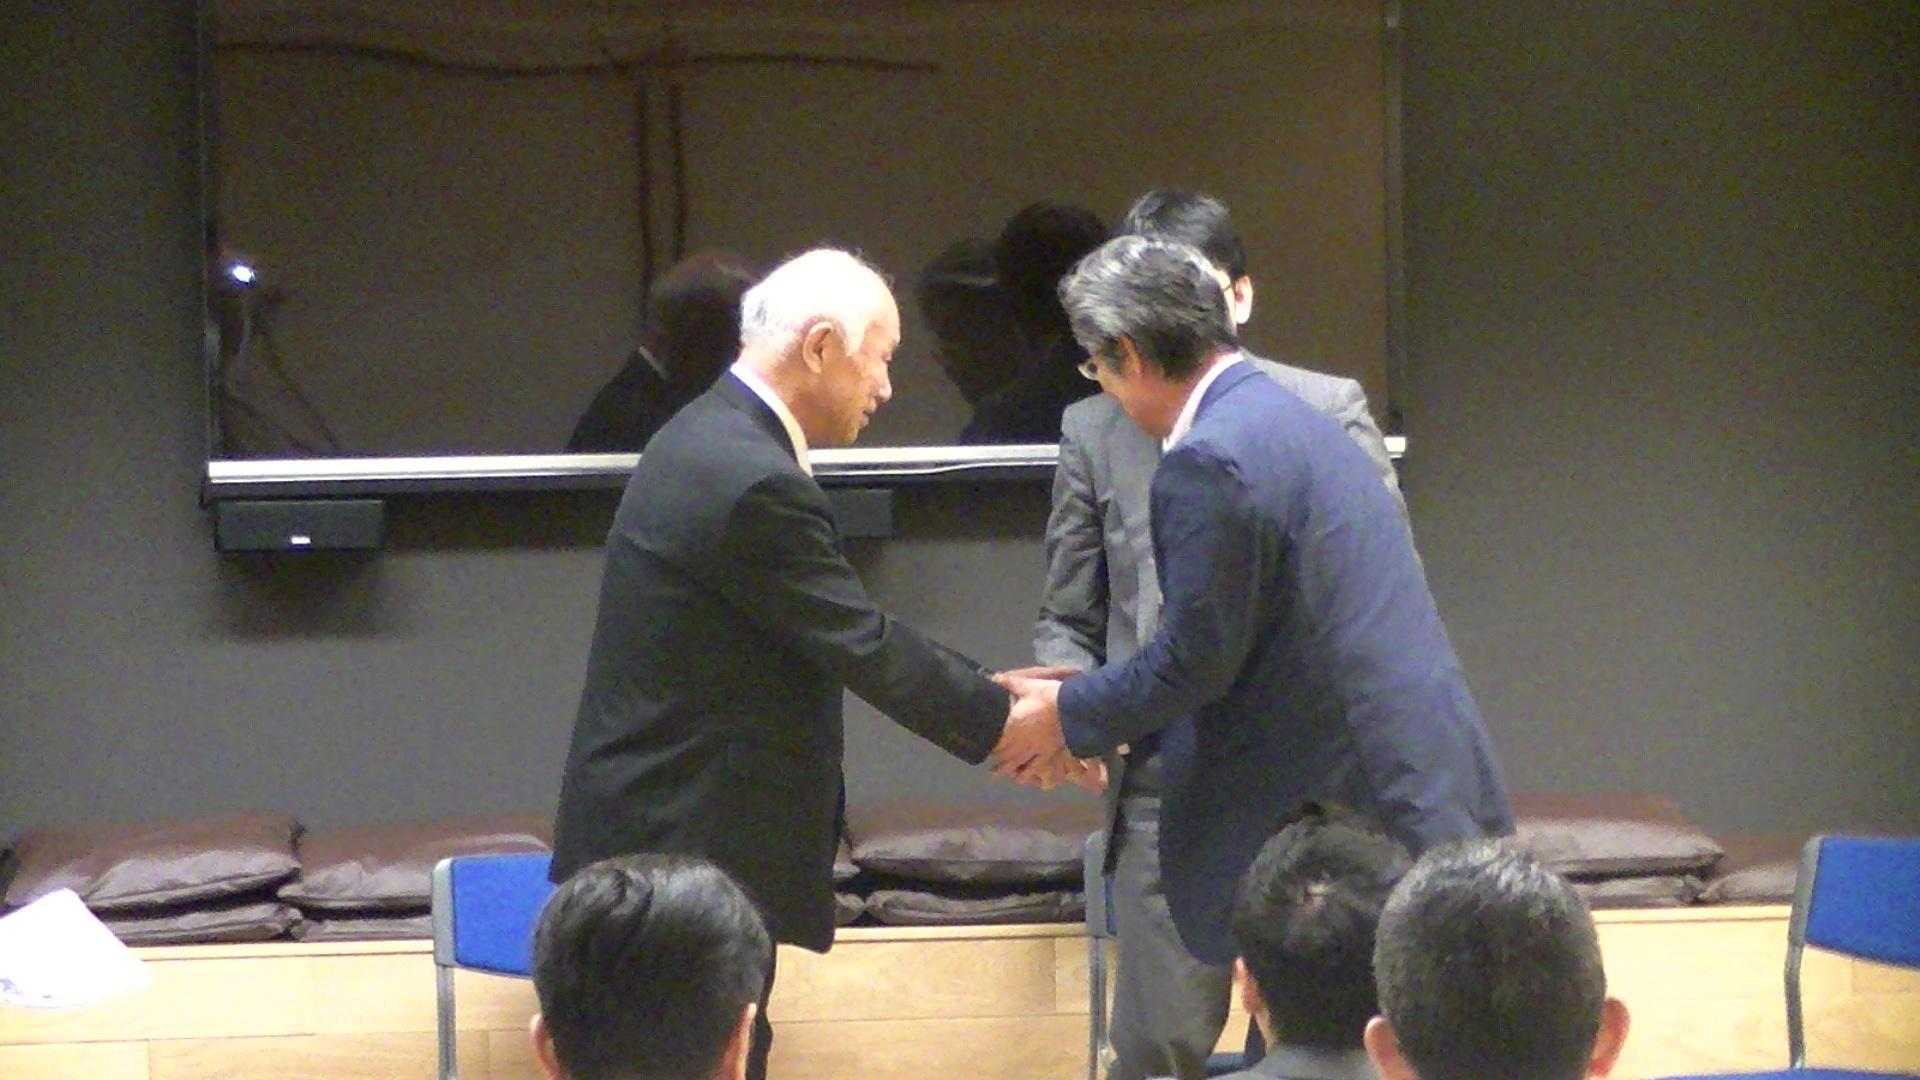 PIC 0047 - 4月1日東京思風塾の開催になります。